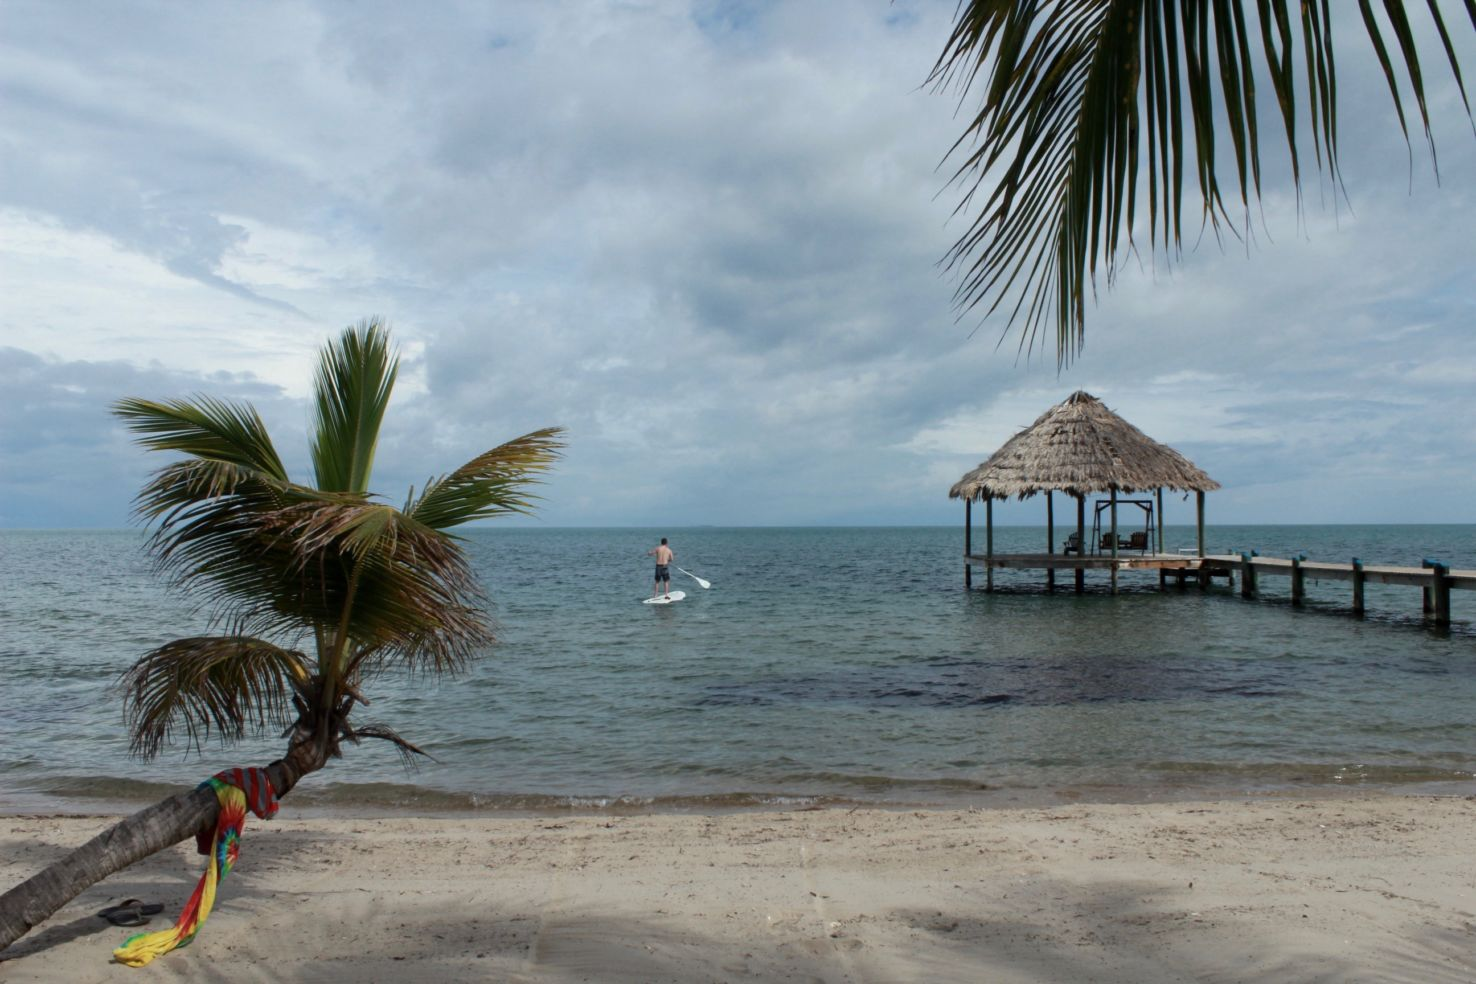 Maya Beach Hotel, Belize, Central America, Caribbean